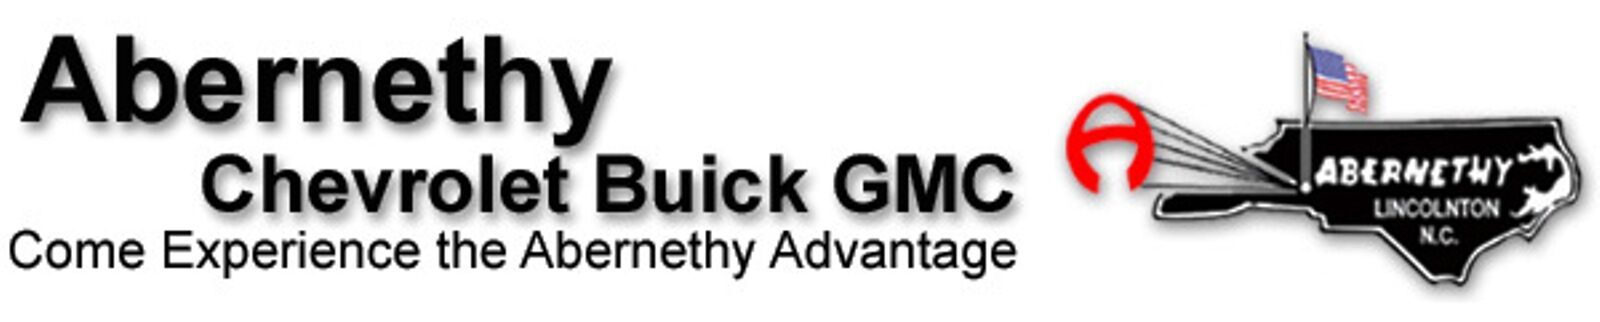 Abernethy Chevrolet Buick GMC